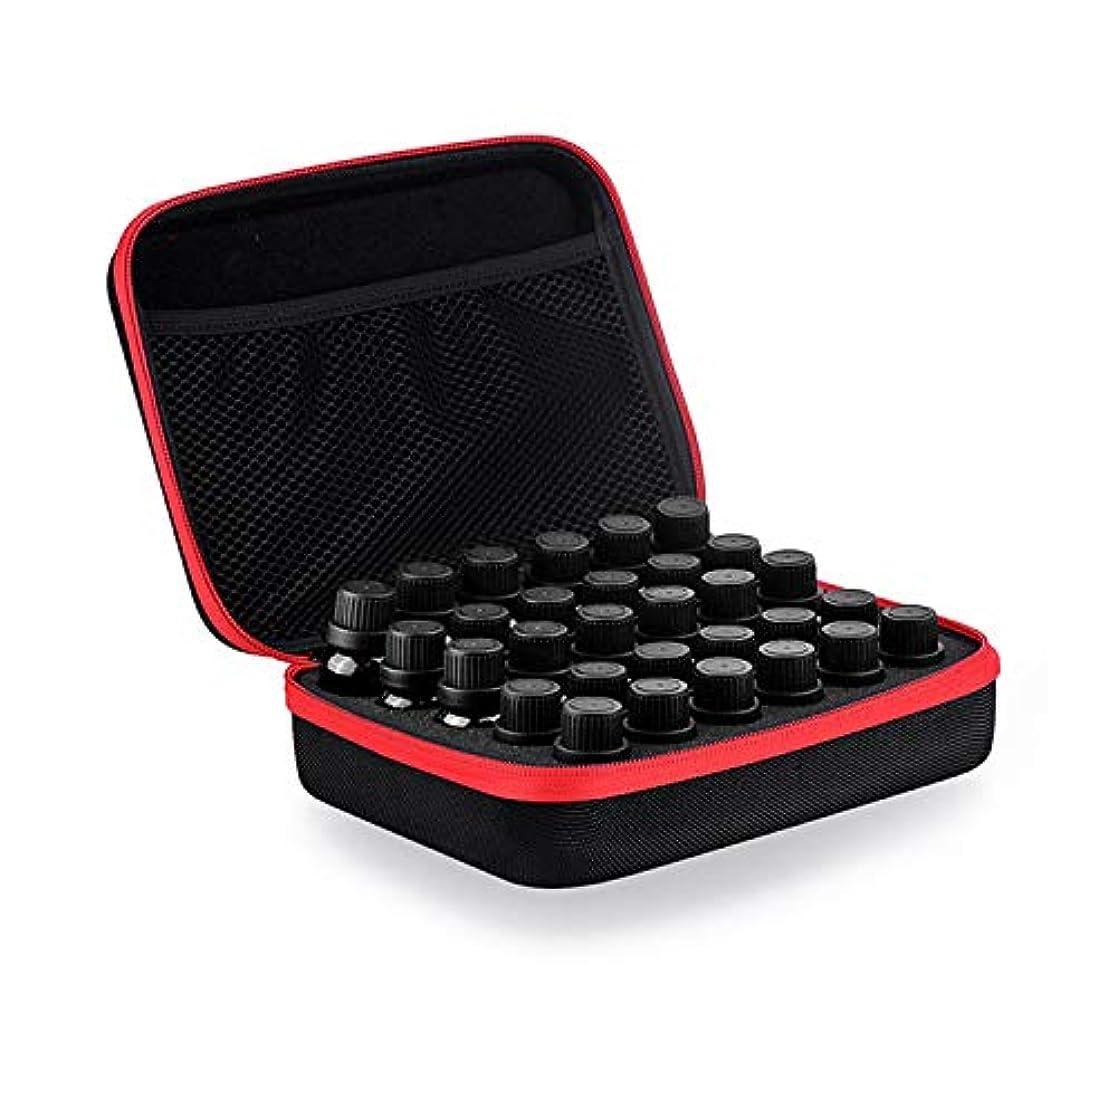 Coteco 精油 ケース 化粧品袋30スロットボトルエッセンシャルオイルケース用保護5/10/15ミリリットルローラーエッセンシャルオイルバッグ 旅行 キャリング 収納オーガナイザー (赤)